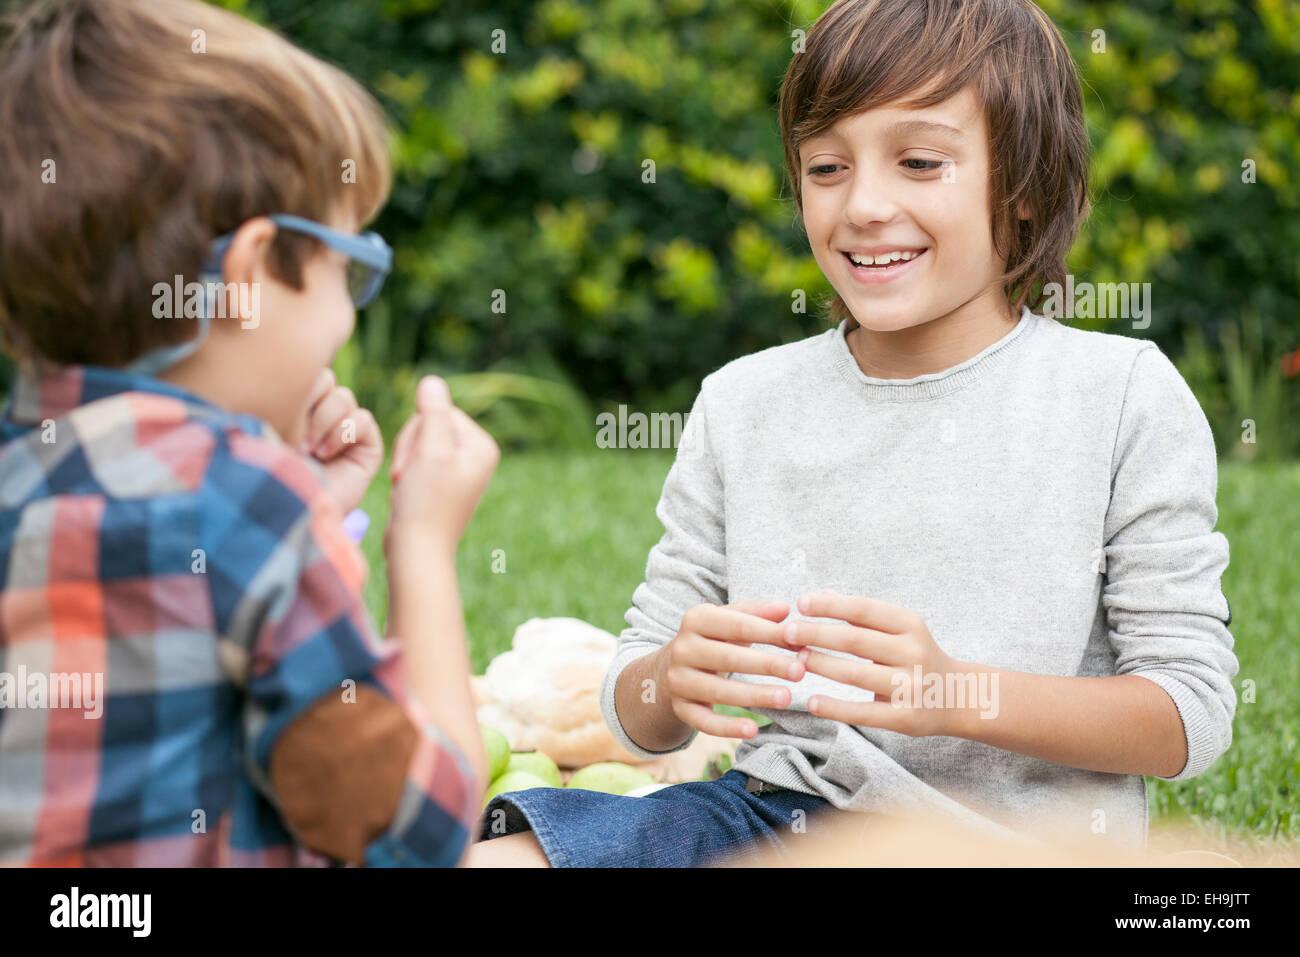 Boys playing hand game - Stock Image